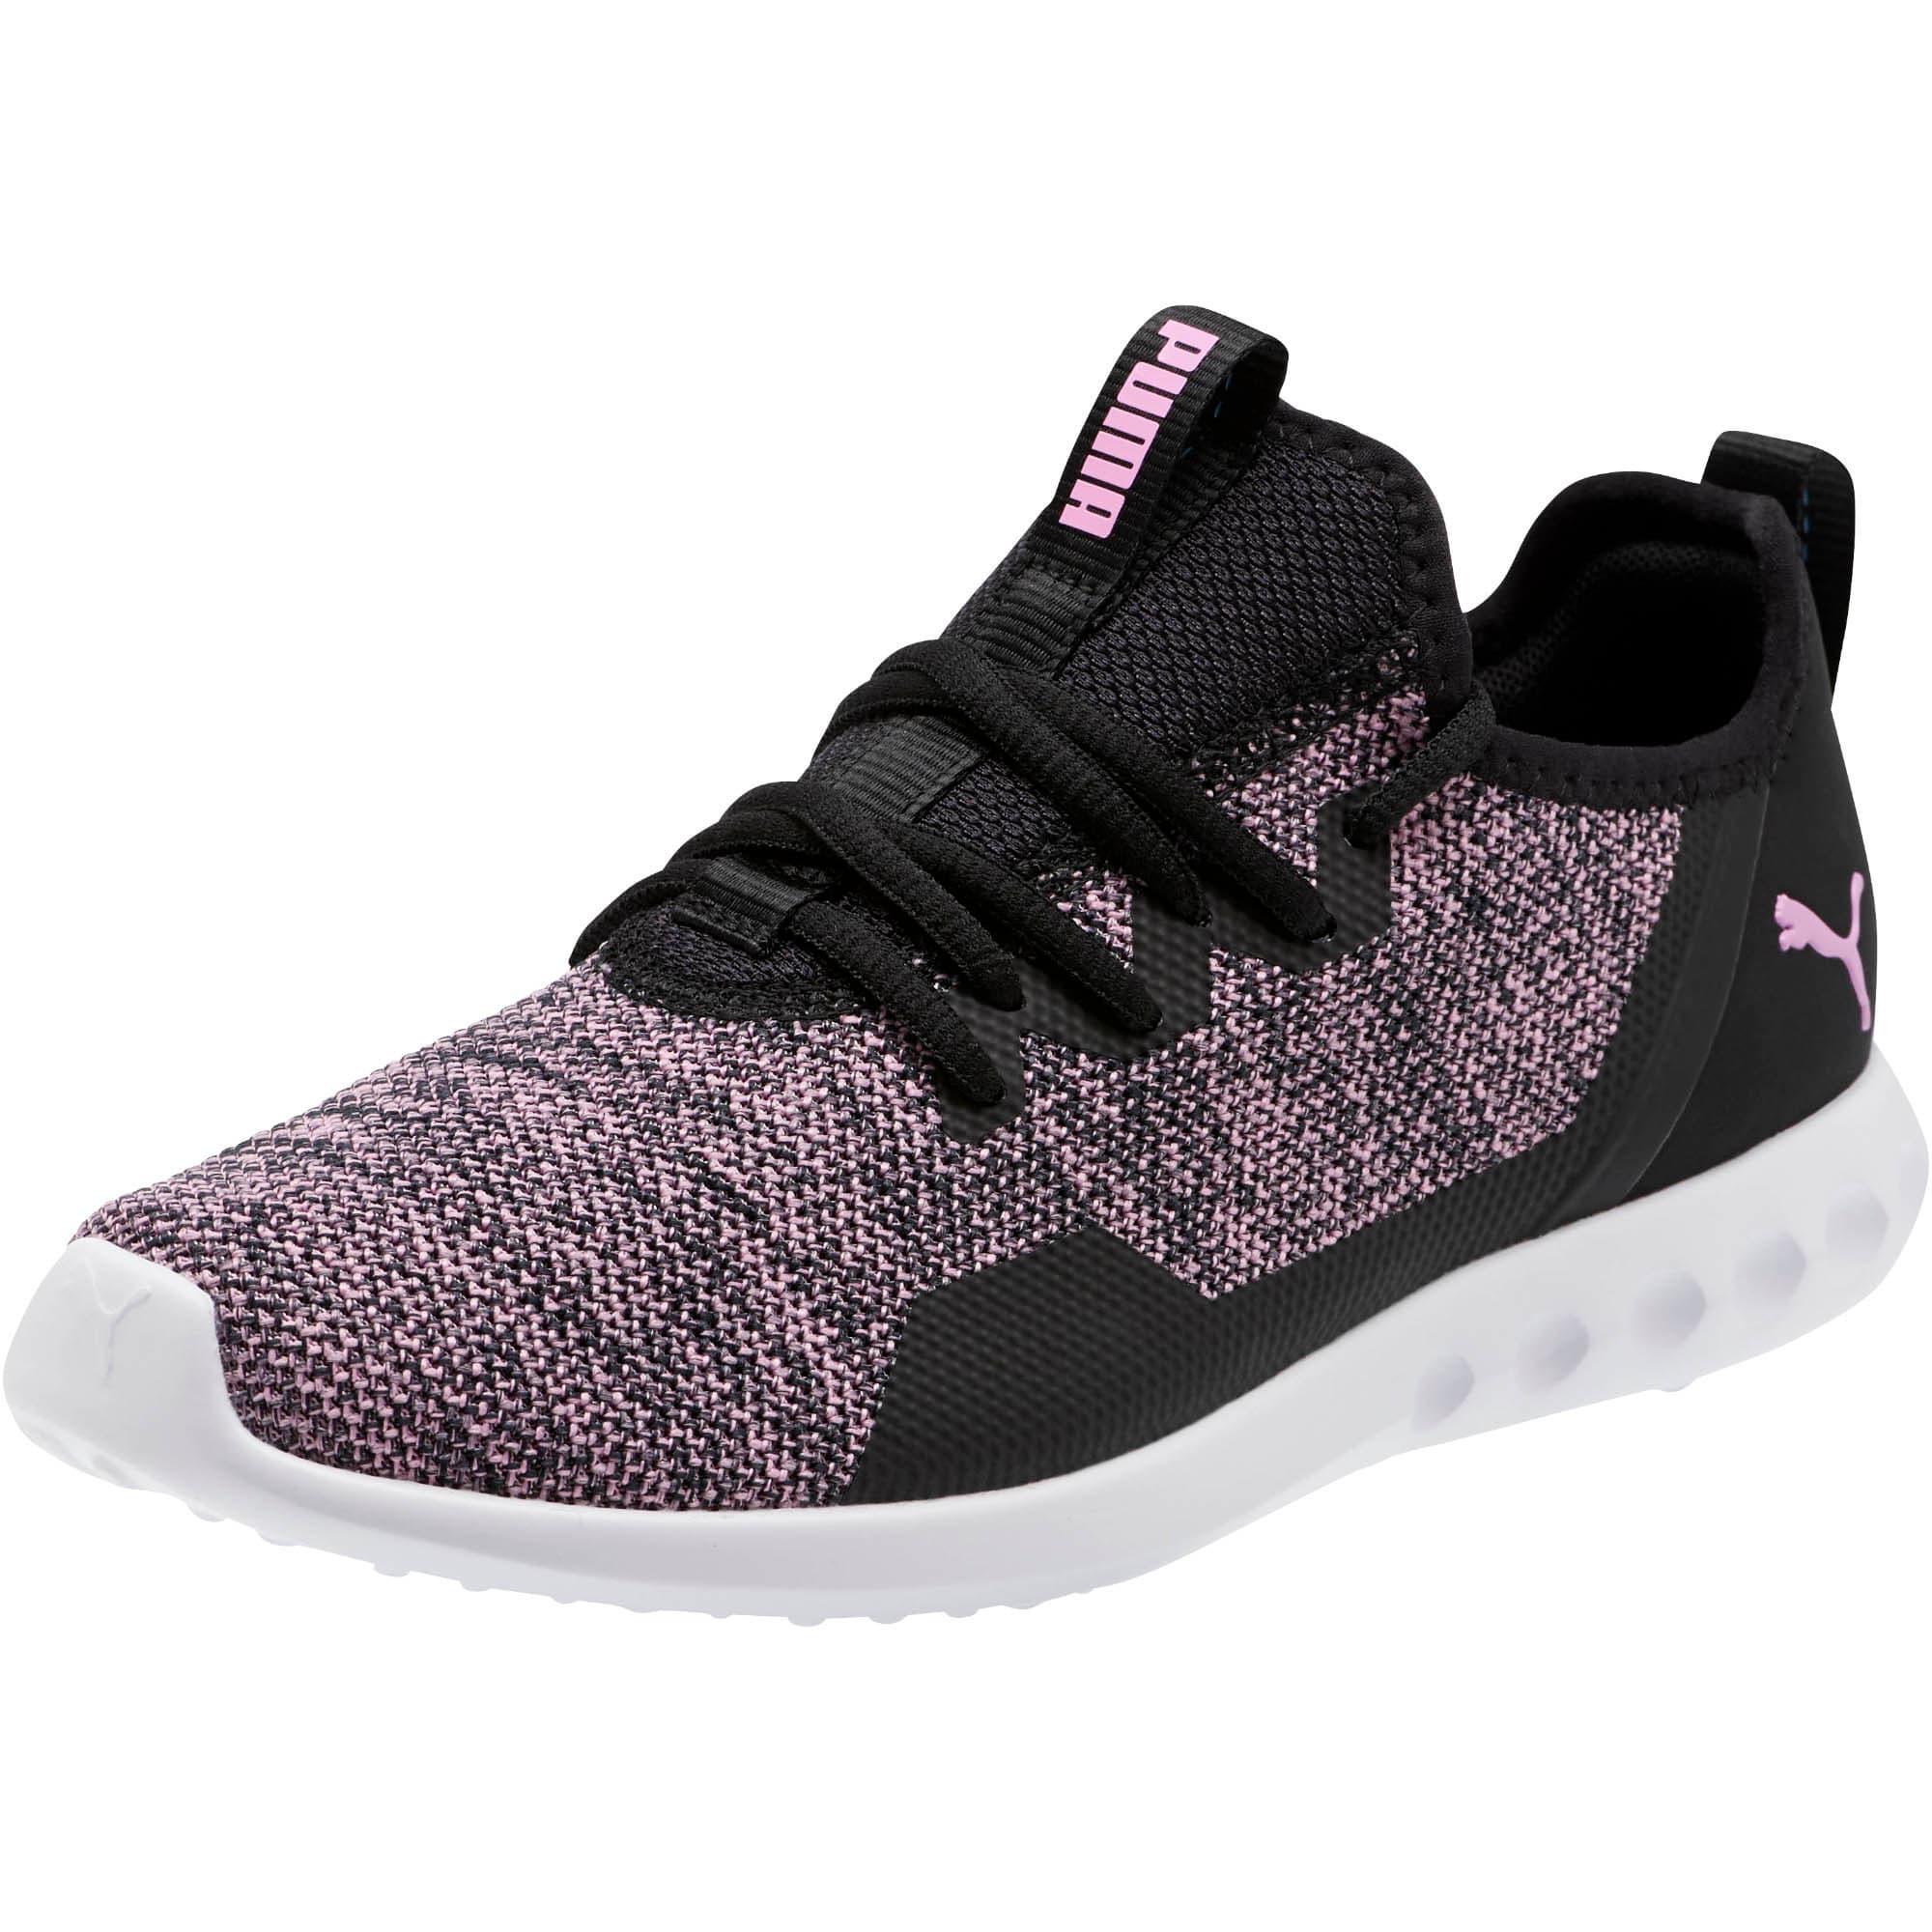 Thumbnail 1 of Carson 2 X Knit Women's Running Shoes, Puma Black-Orchid, medium